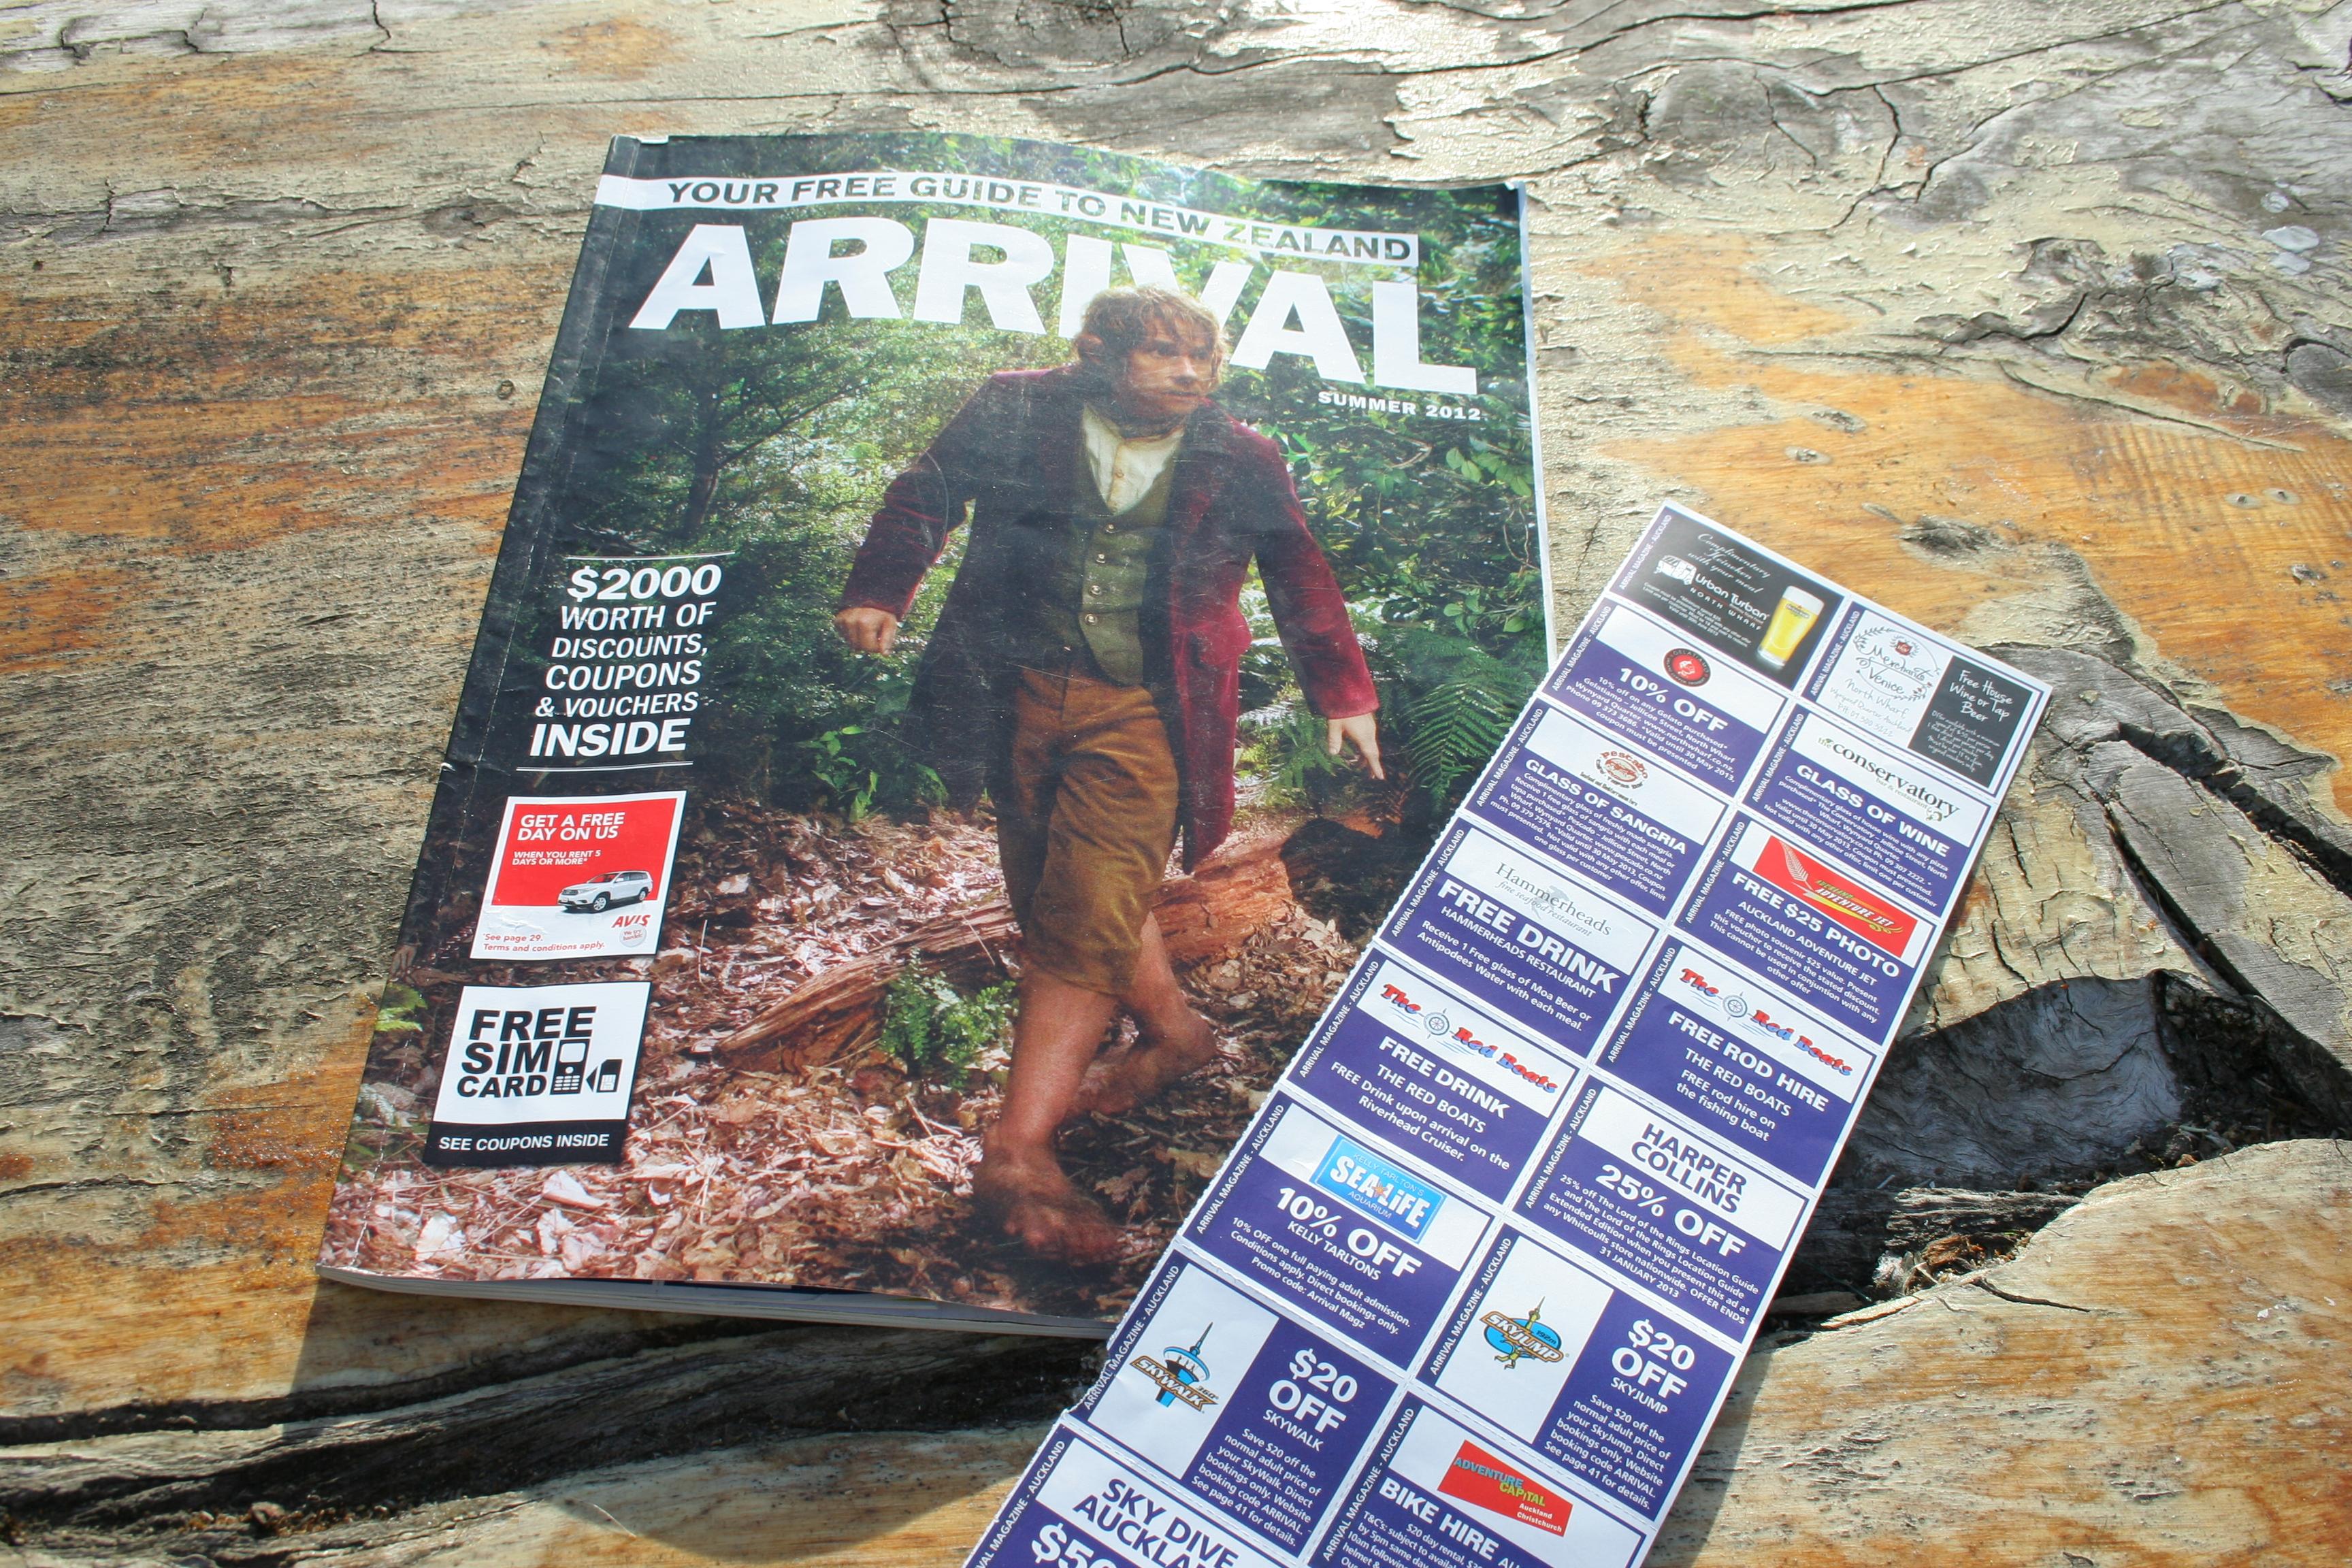 Arrival magazine